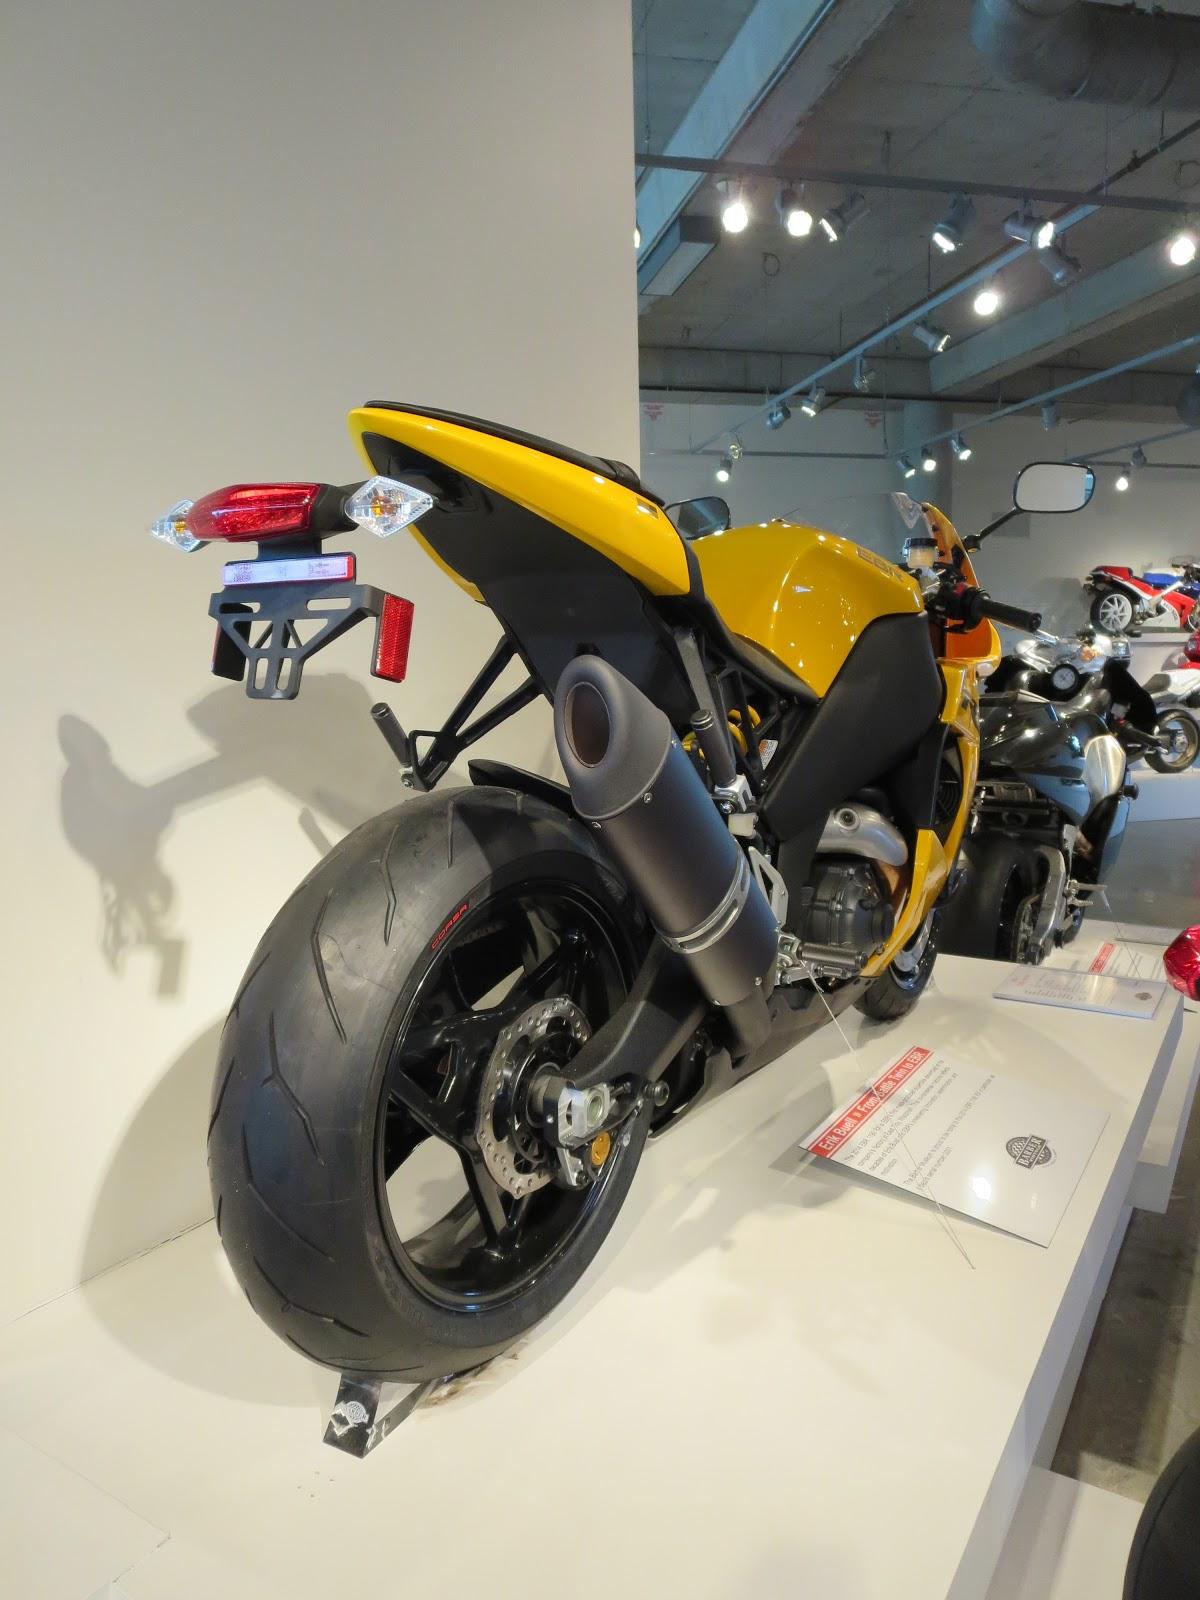 EBR 1190RX